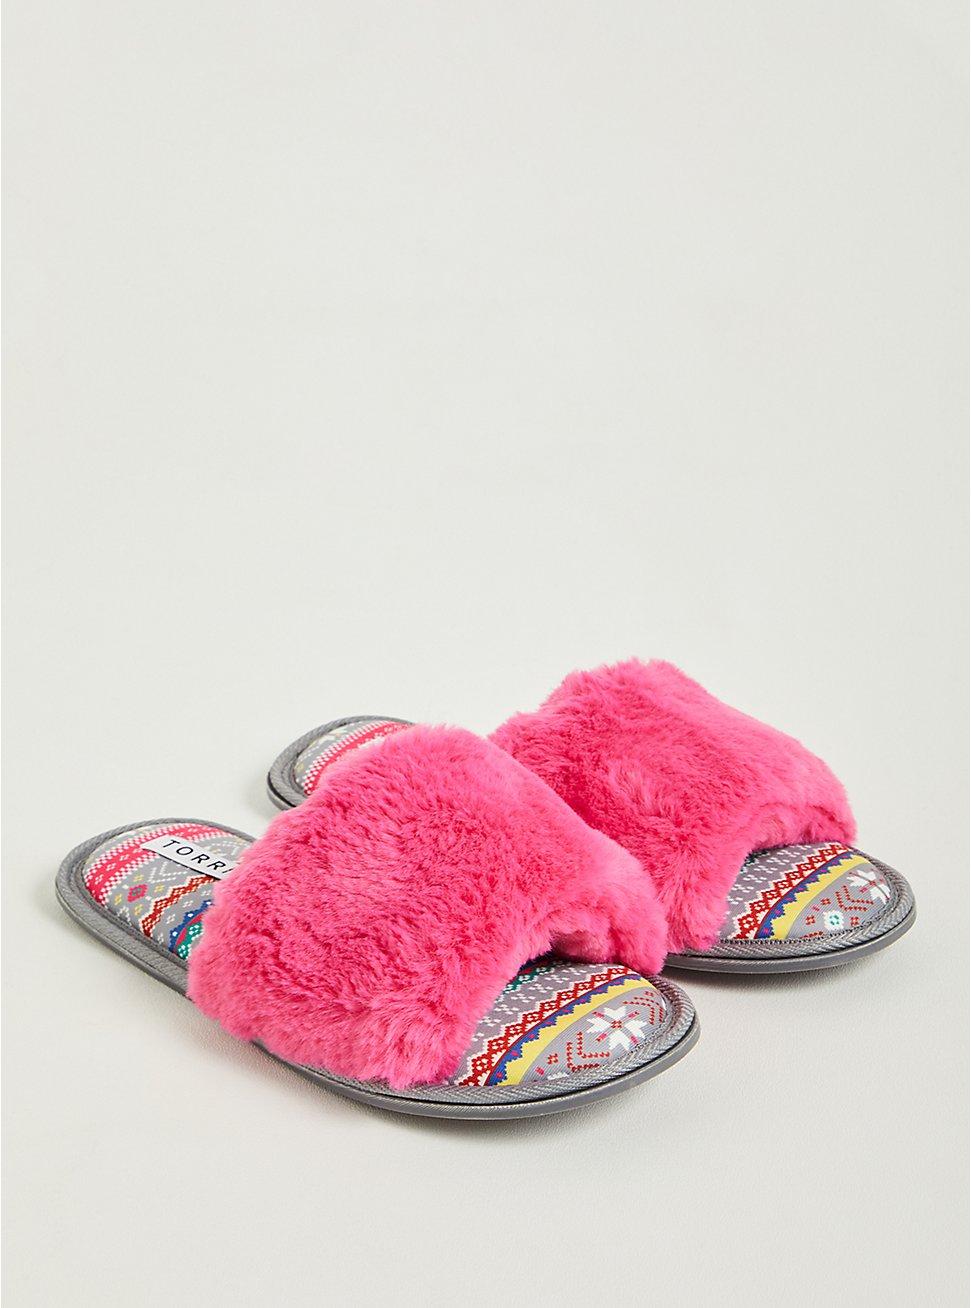 Fur Band Slipper - Pink (WW), PINK, hi-res